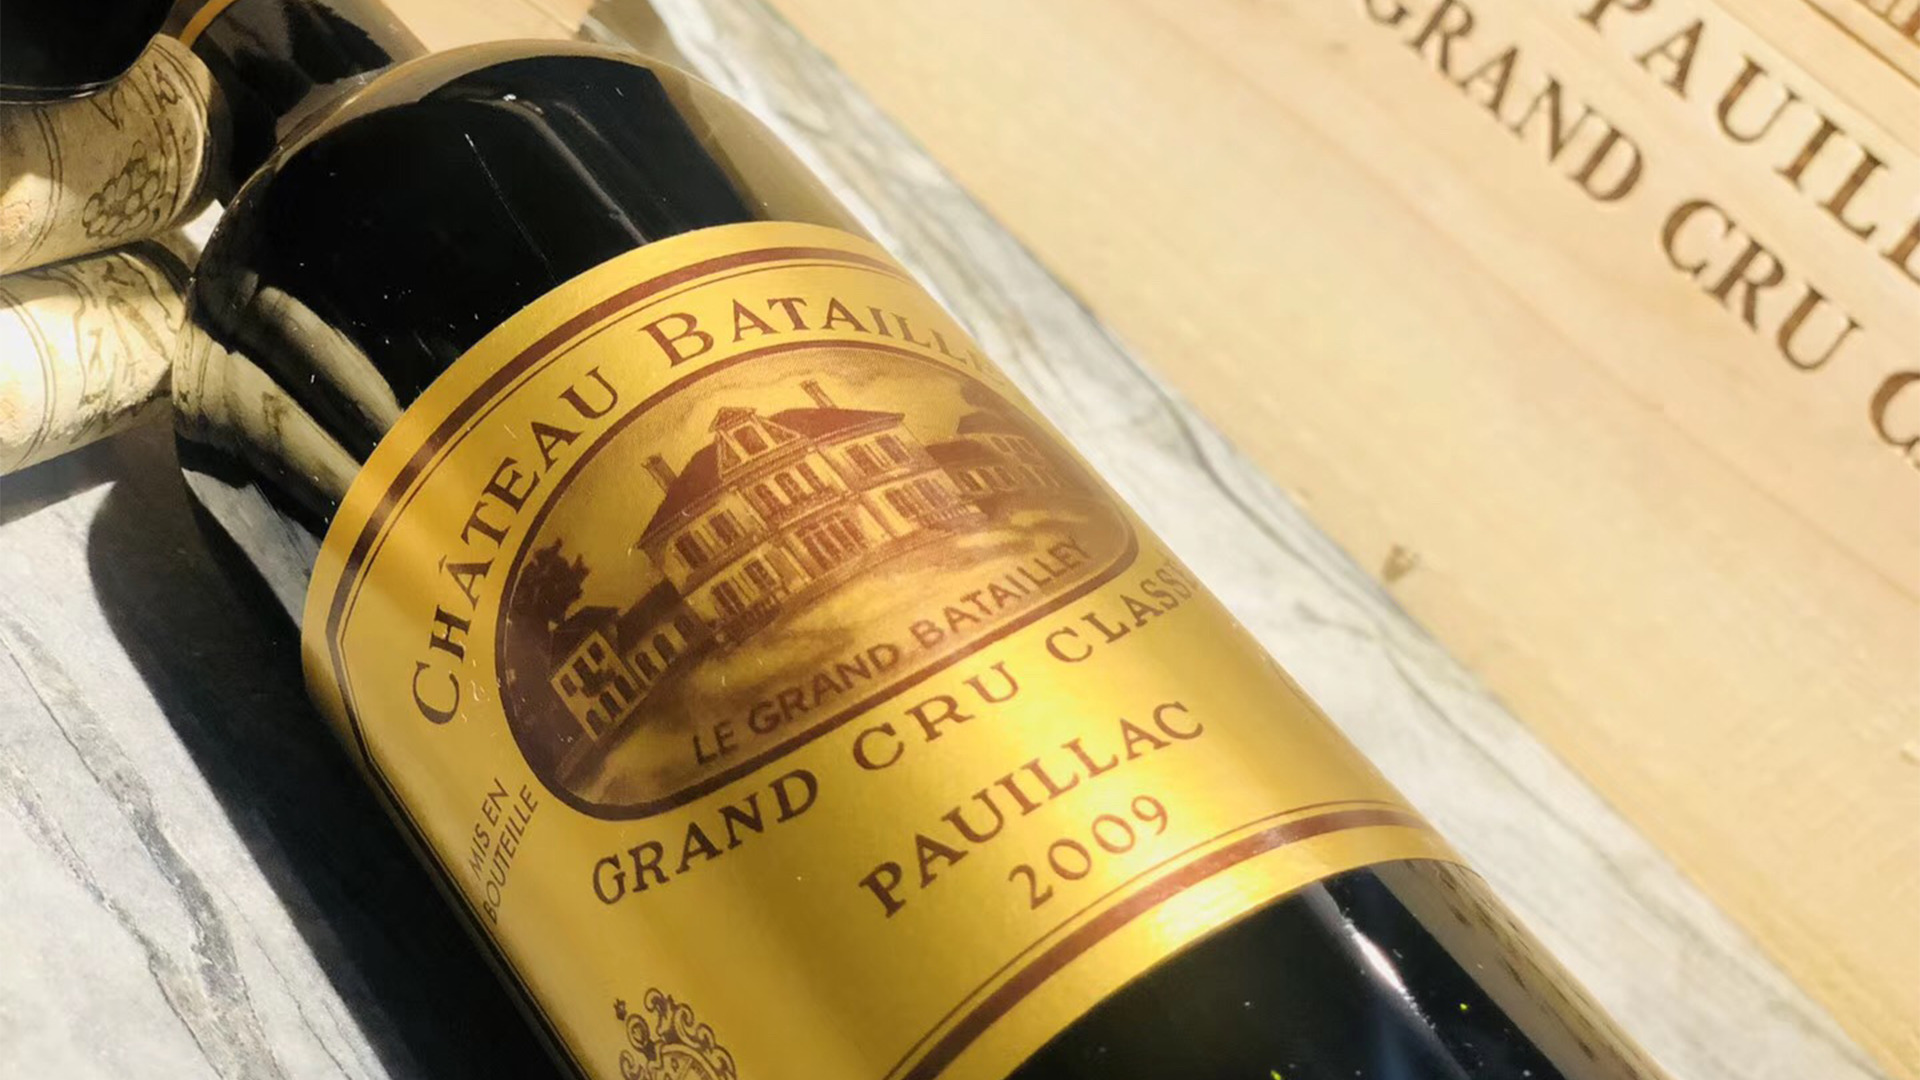 Rượu Vang Chateau Batailley